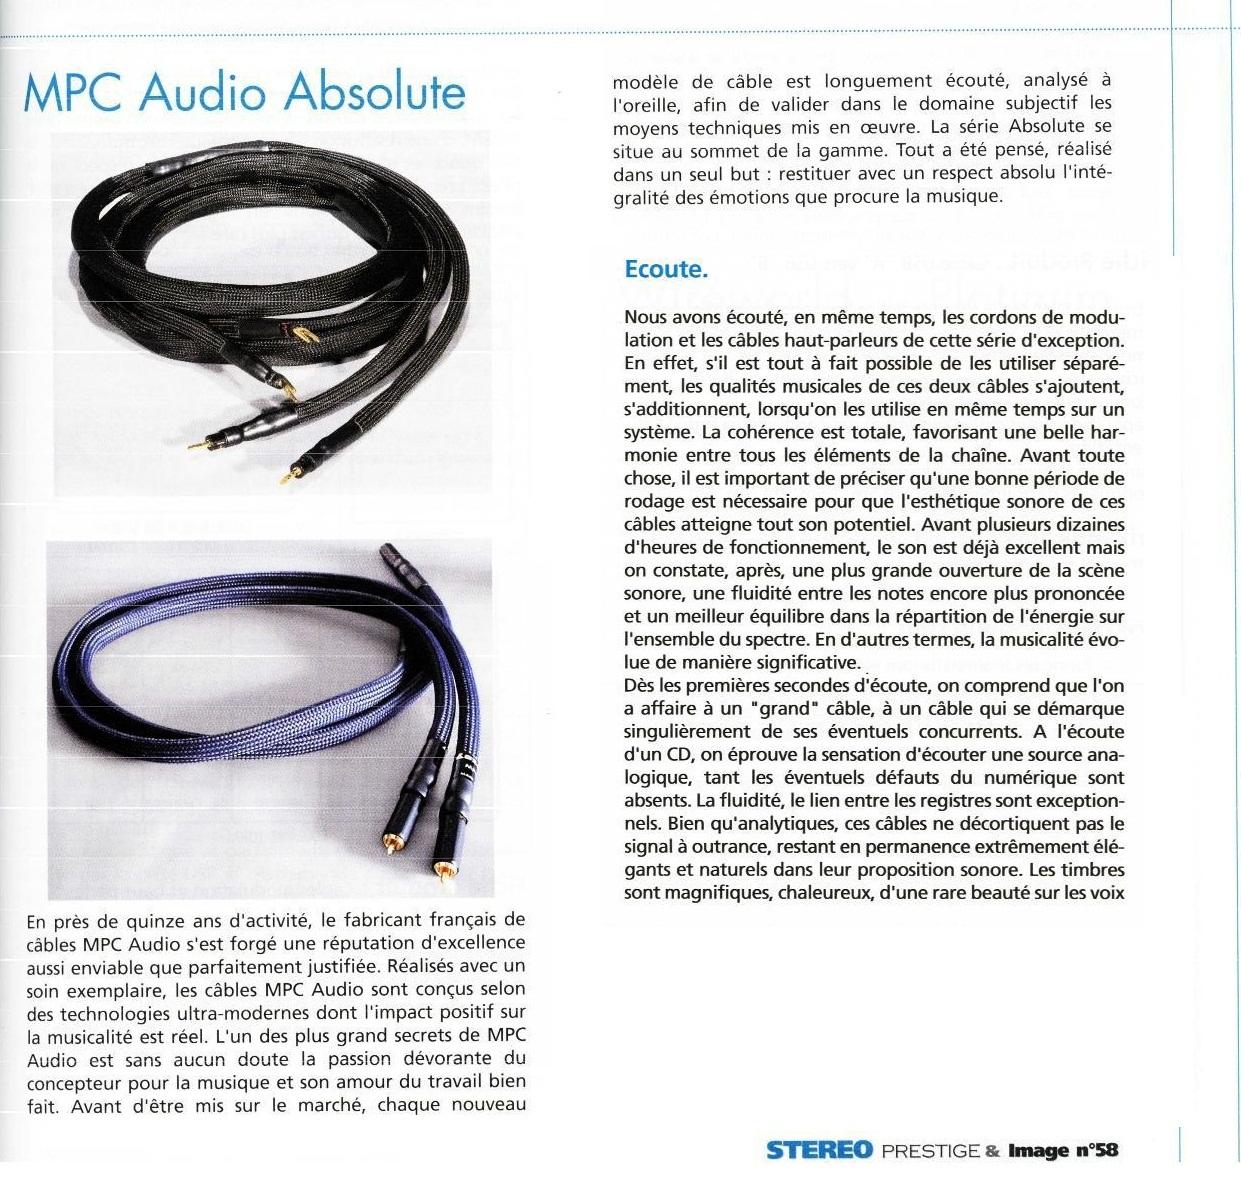 2011 - Test Absolute HP et Modulation Stereo Prestige Juillet Aout 2011 1 sur 2